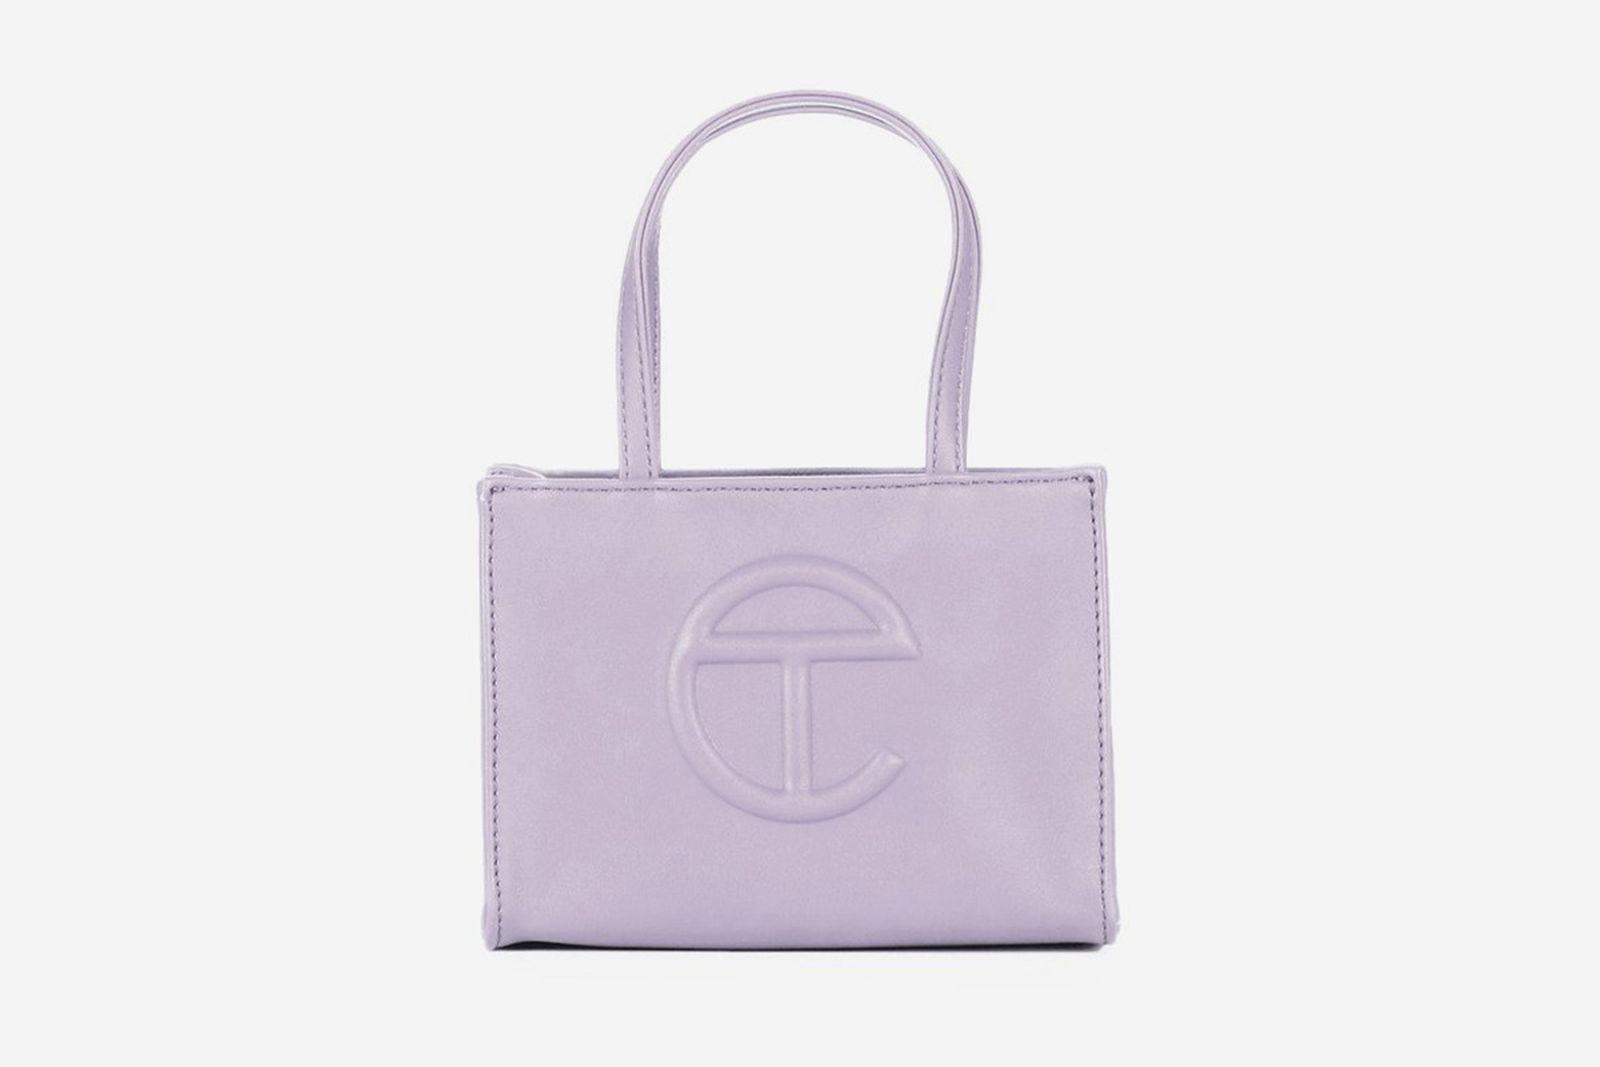 telfar bags